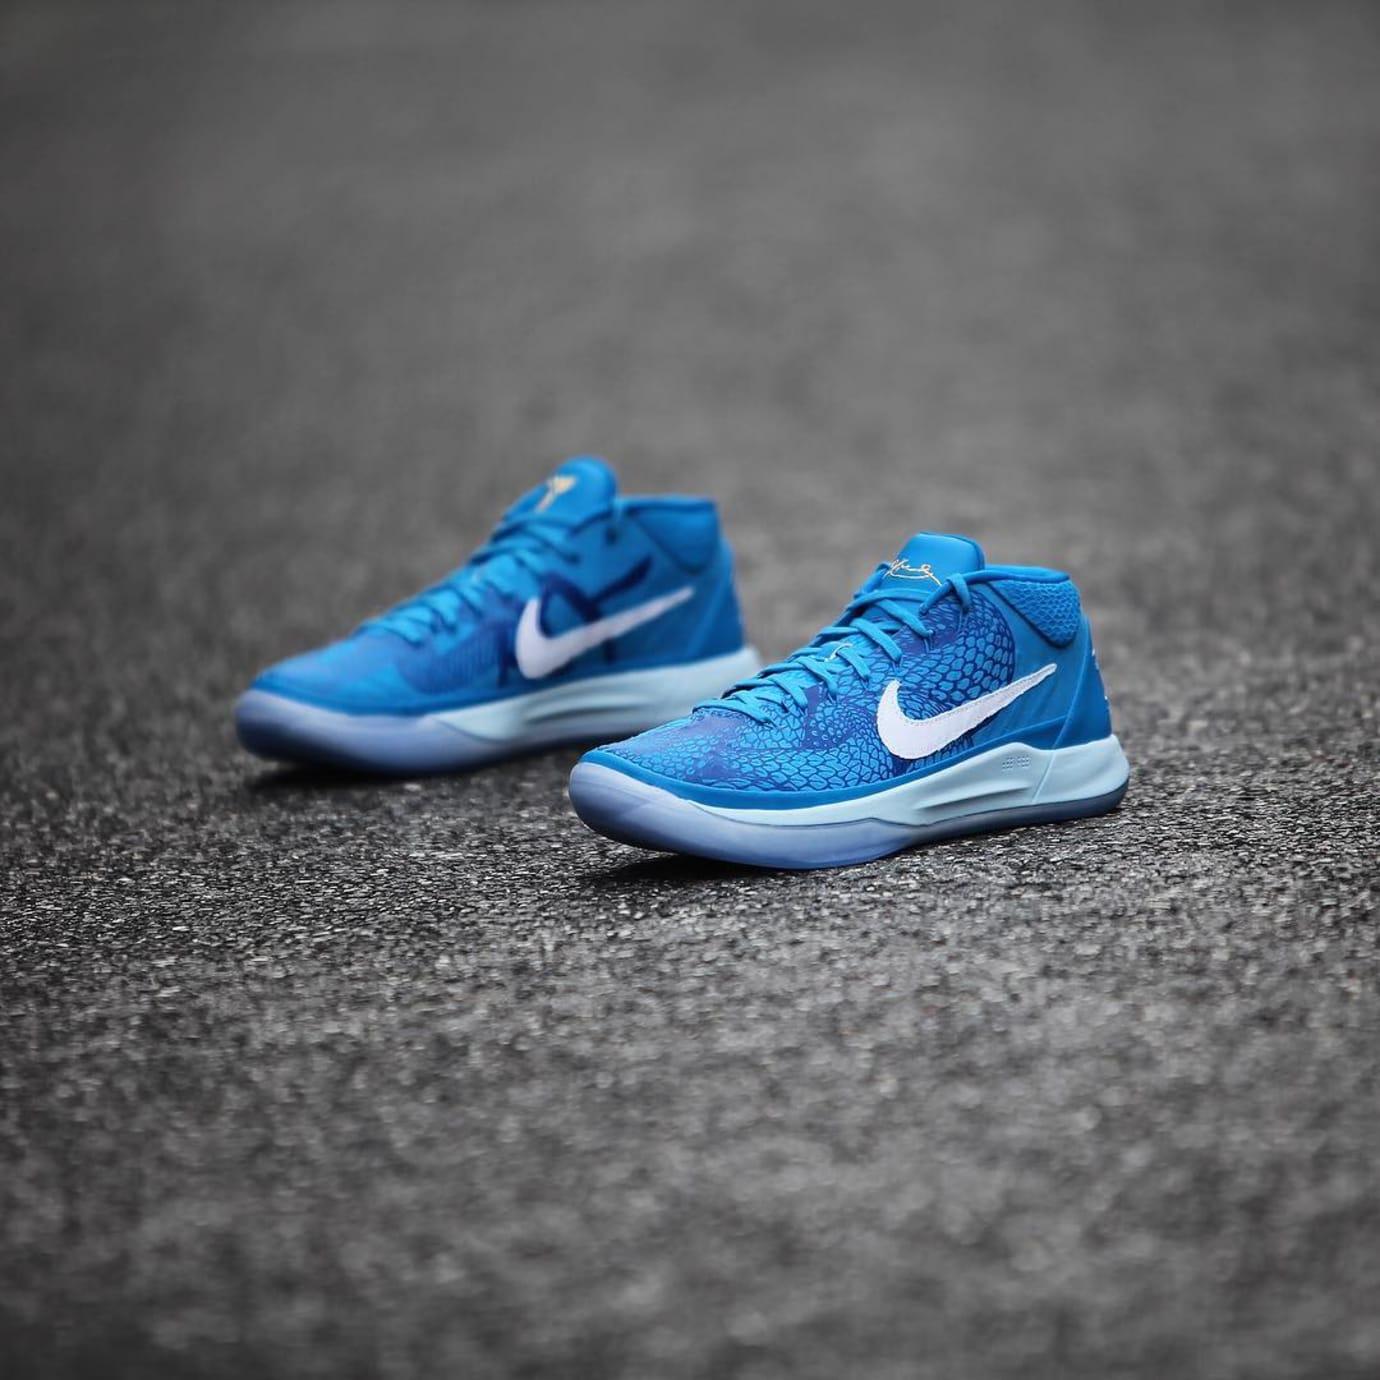 new concept e789f 0cc37 Nike Kobe A.D. Mid DeMar DeRozan PE Release Date   Sole Collector